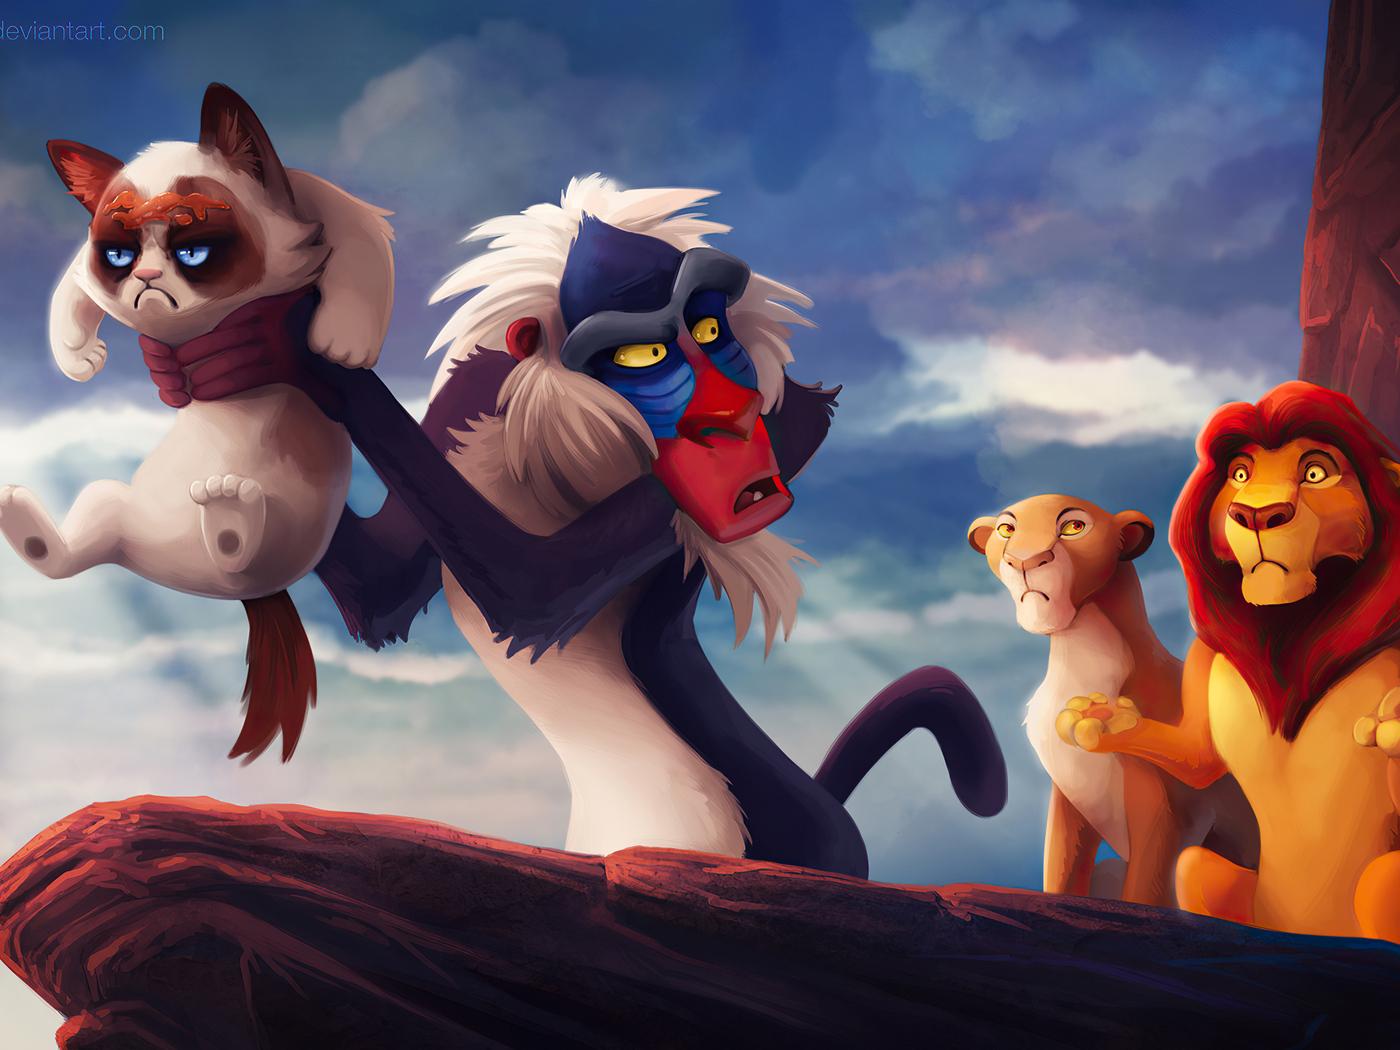 the-lion-king-grumpy-cat-funny-0m.jpg